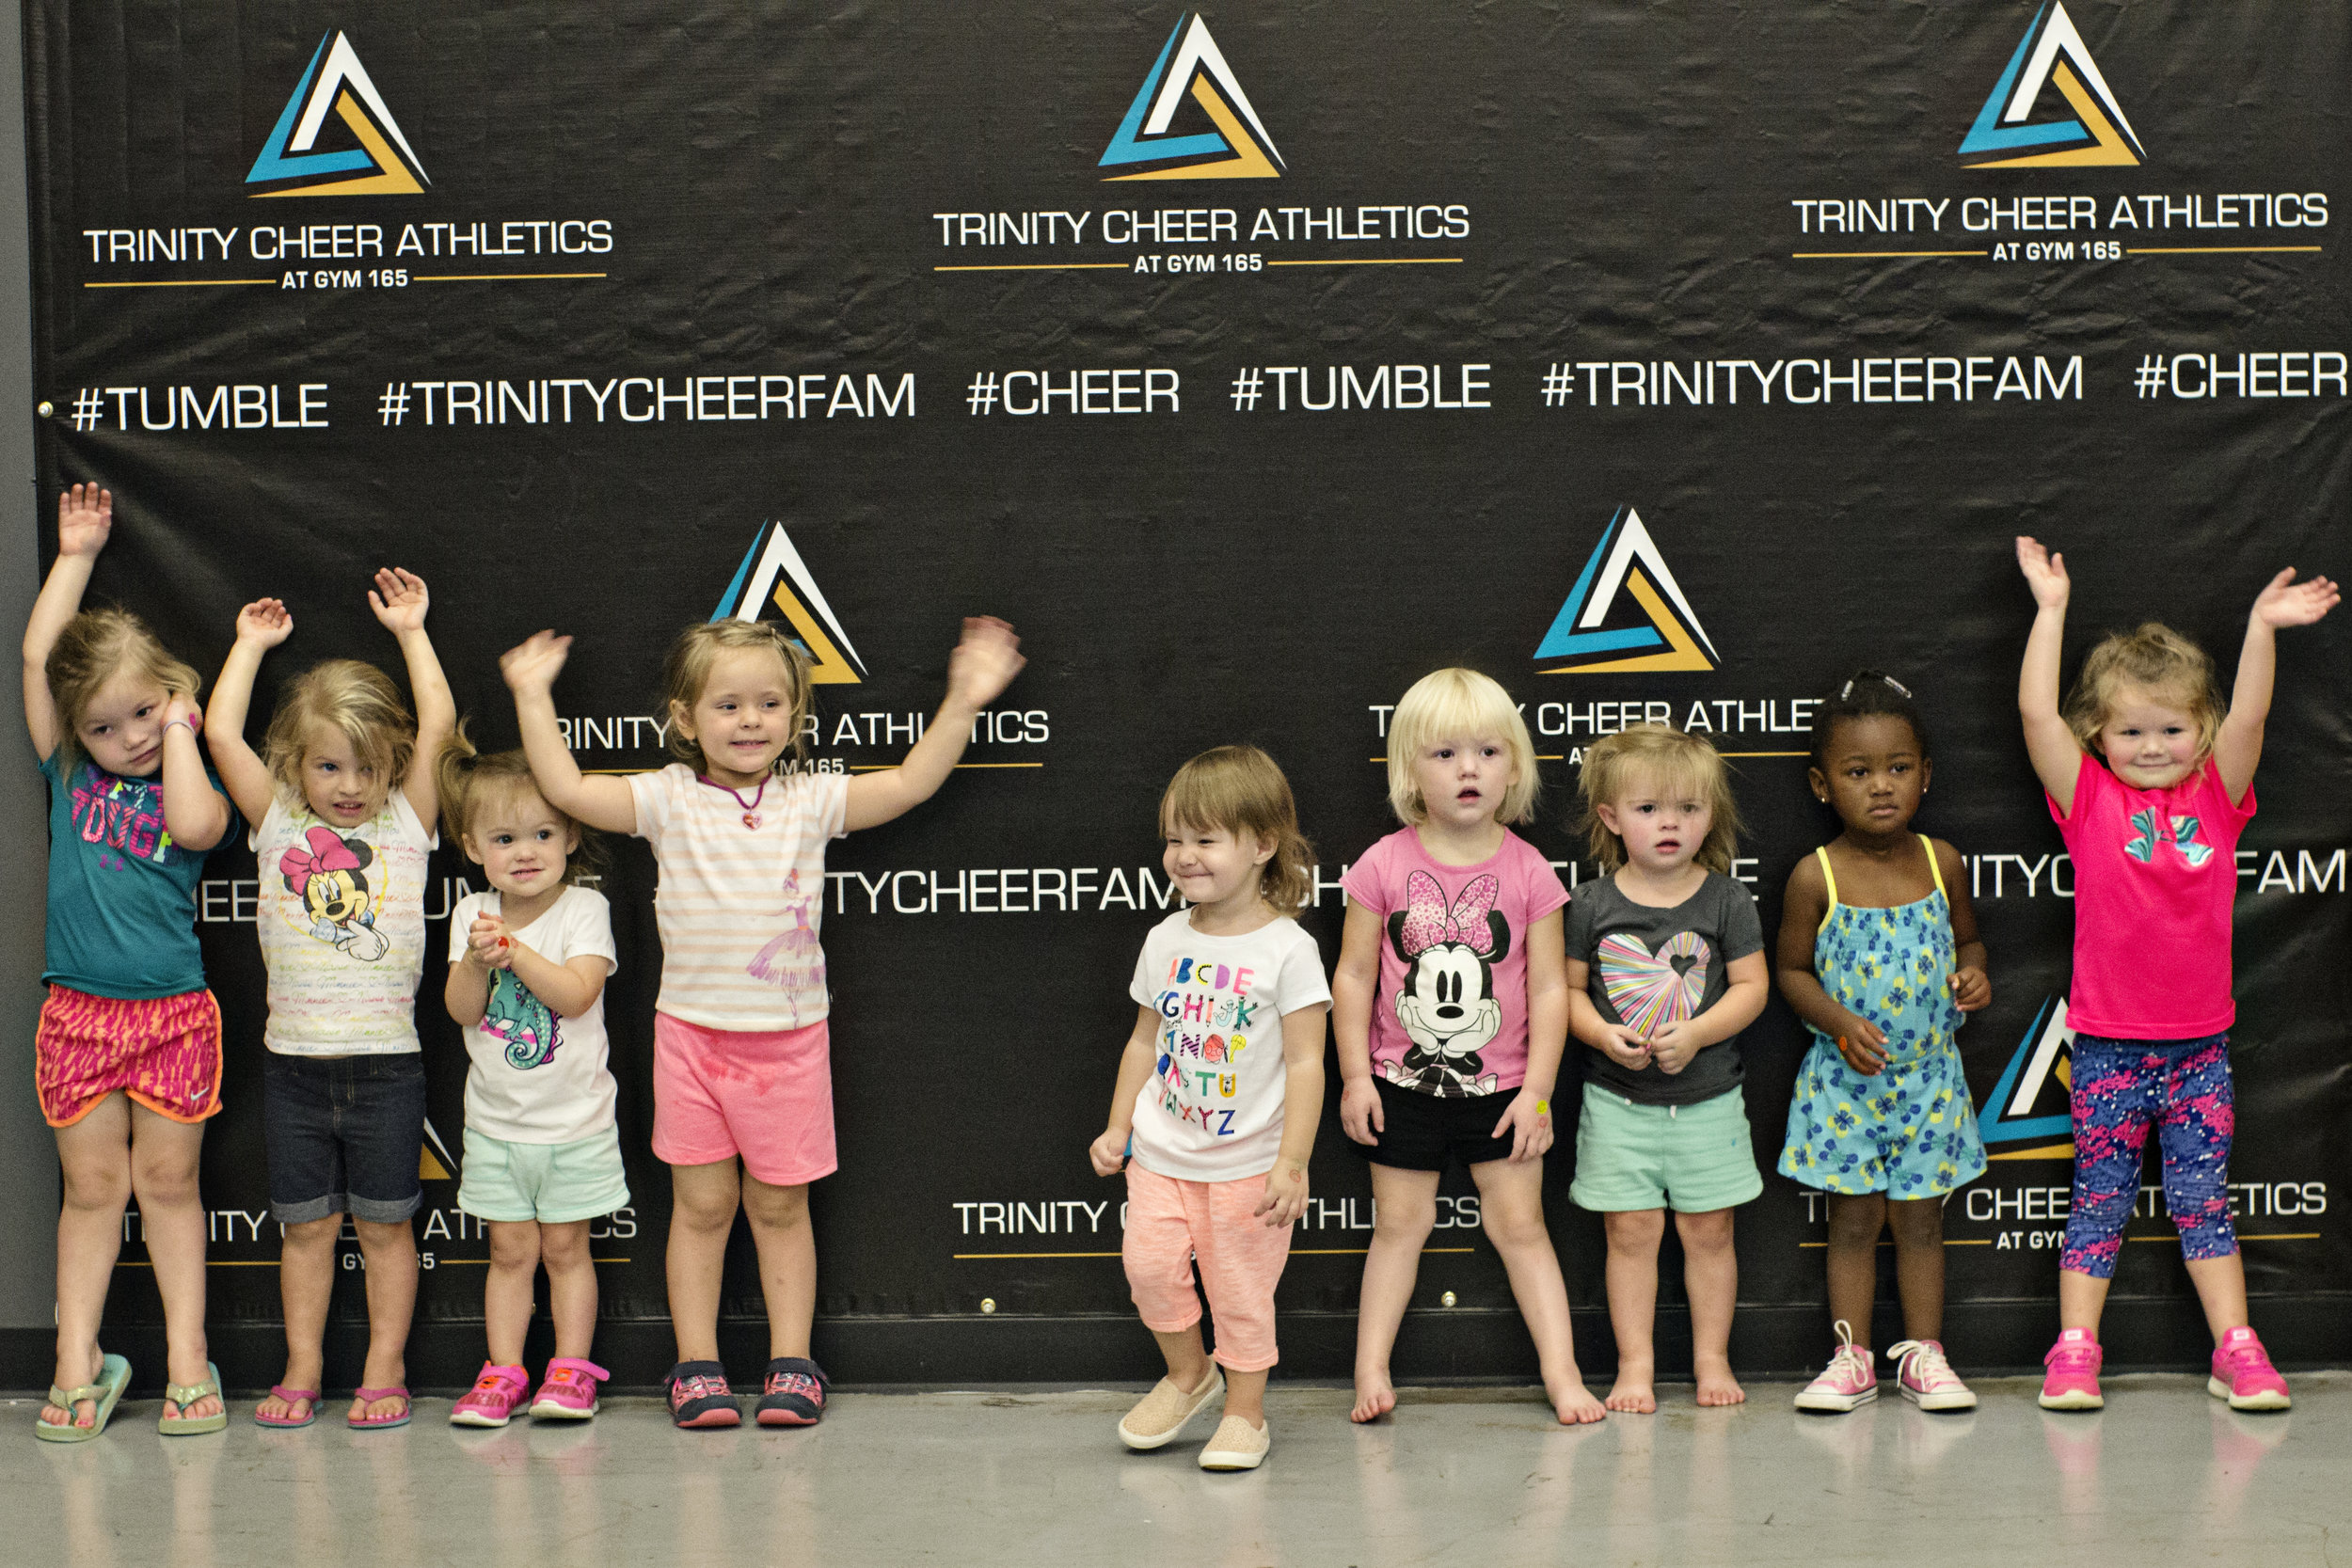 Trinity_Cheer_Athletics_Preschool_046.jpg